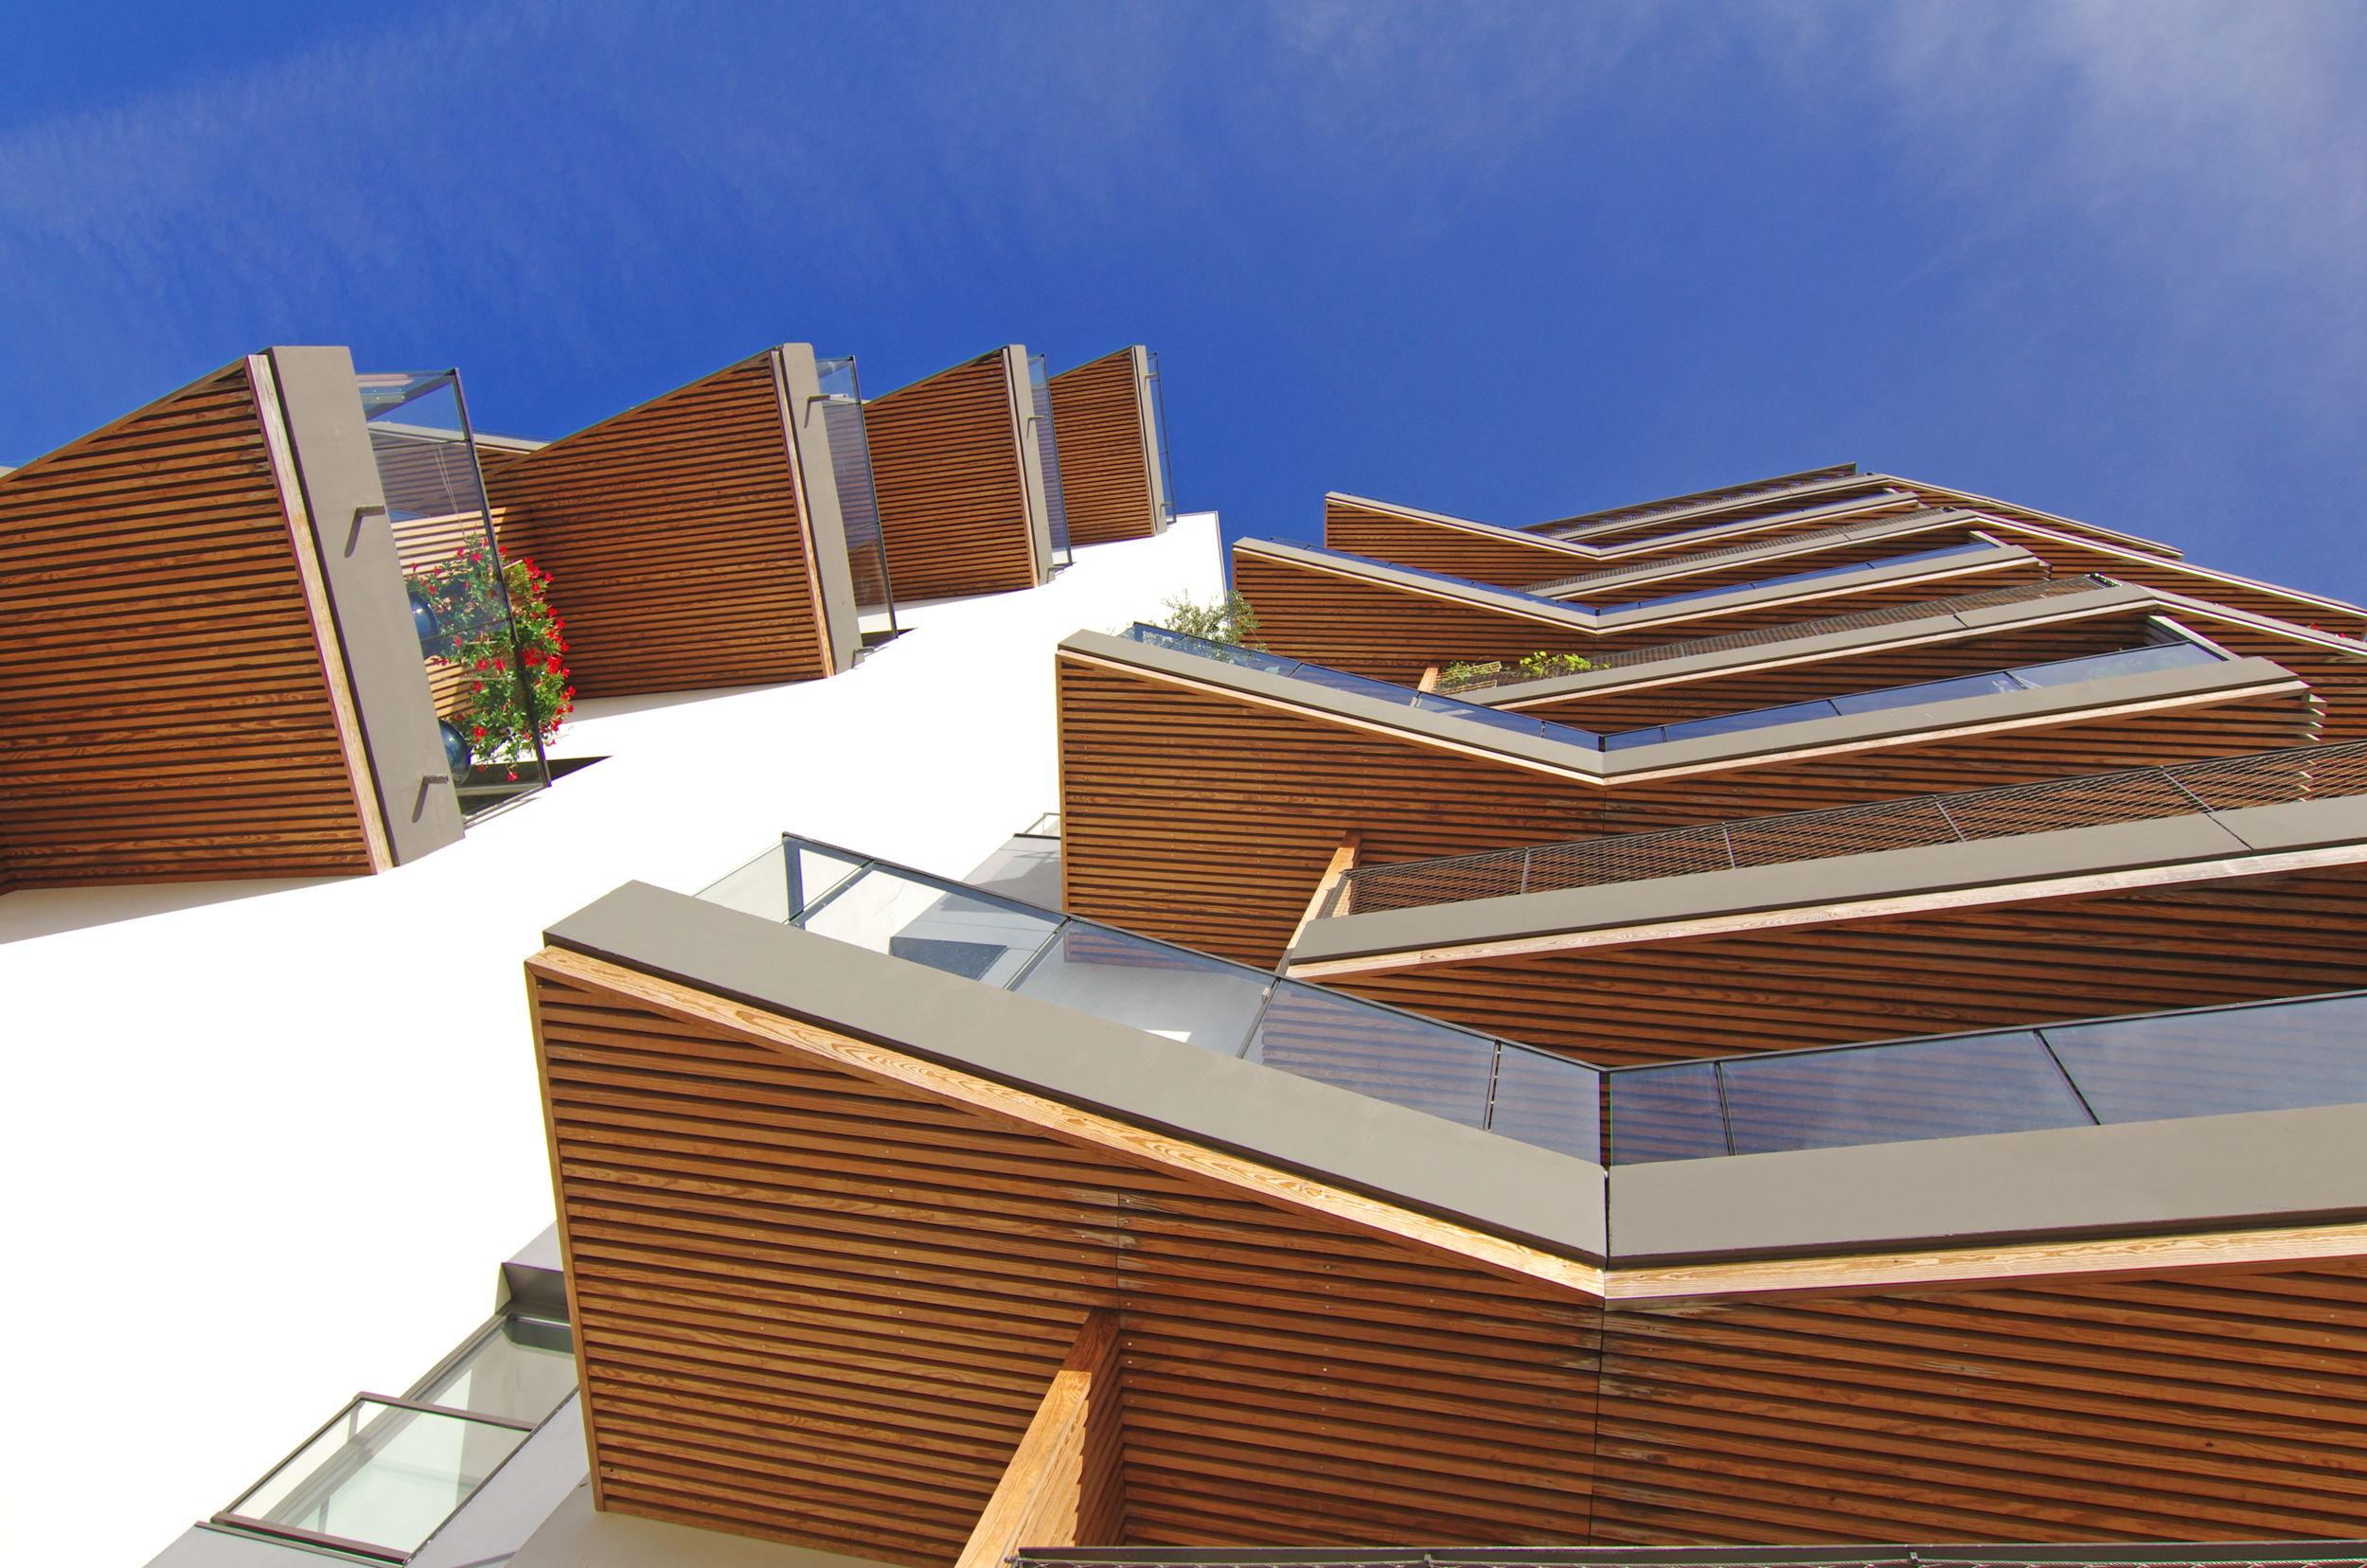 Balconies and The Building (Amendment) Regulations 2018